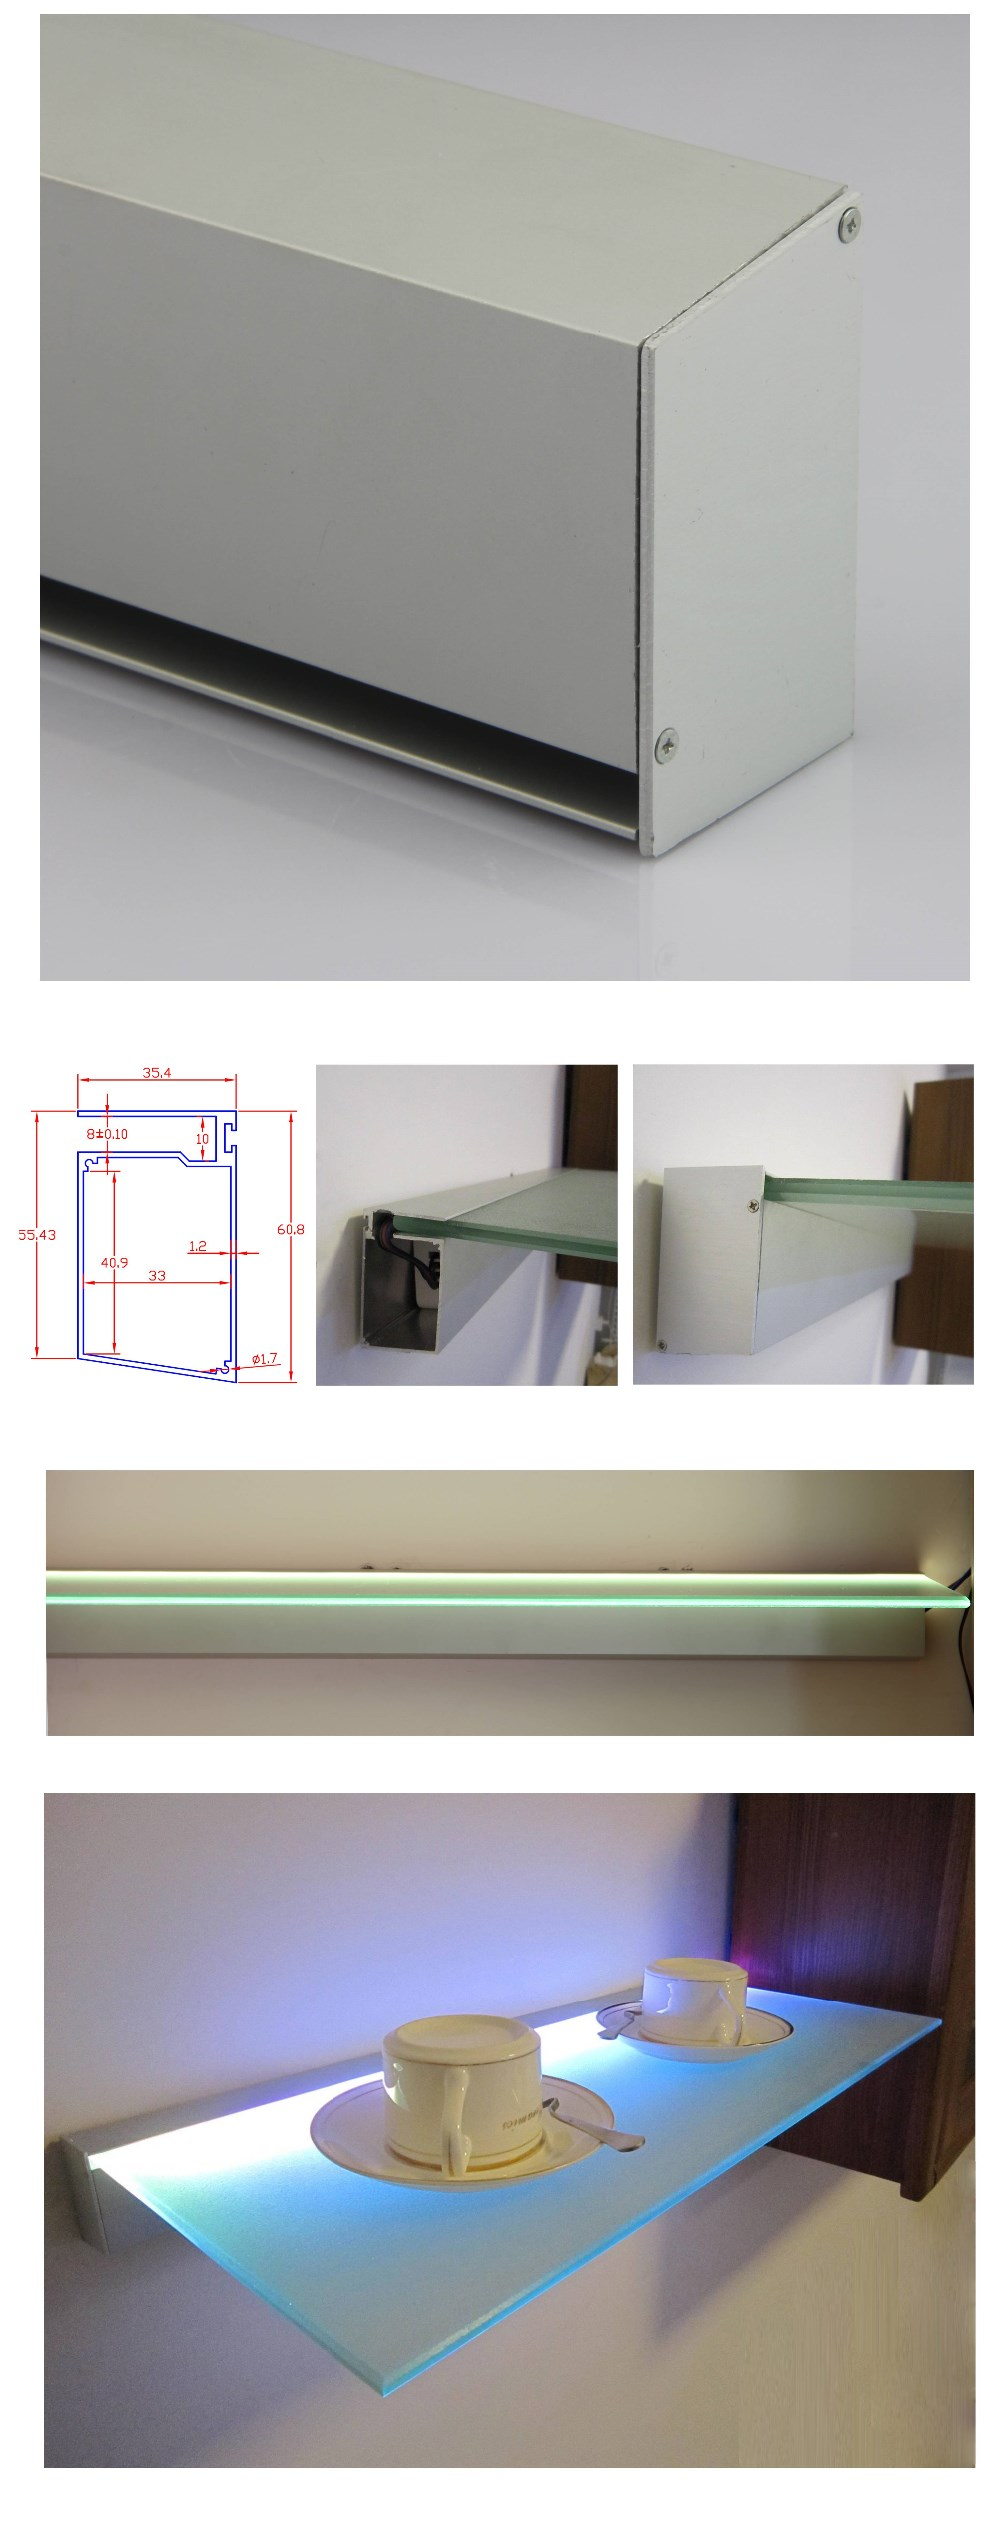 Wandplank Met Lampje.Plank Met Spotjes Ikea Good Tvdressoir Teak Cm Staande Tv Meubelen